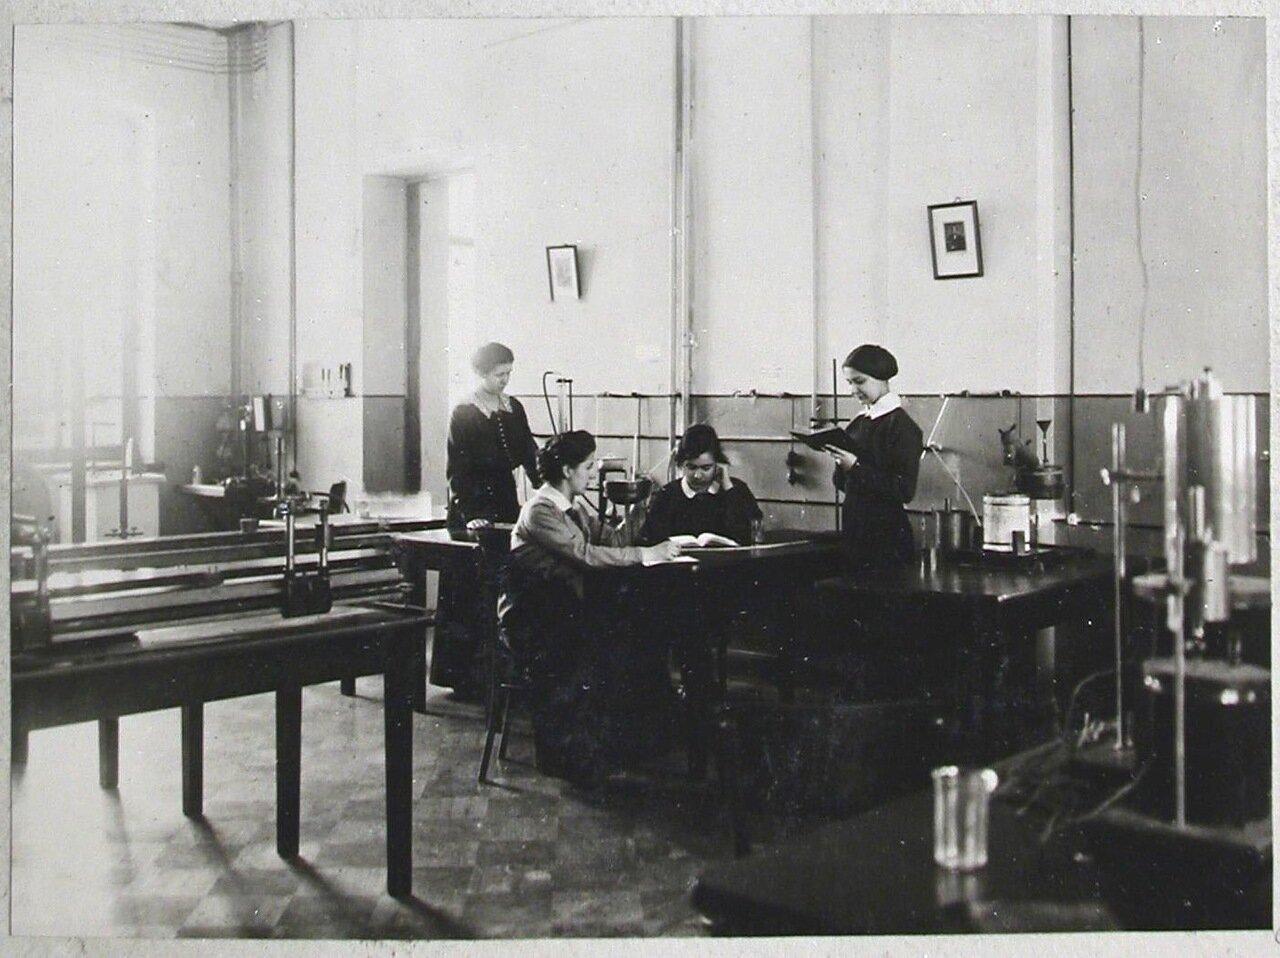 19. Студентки на занятиях в лаборатории